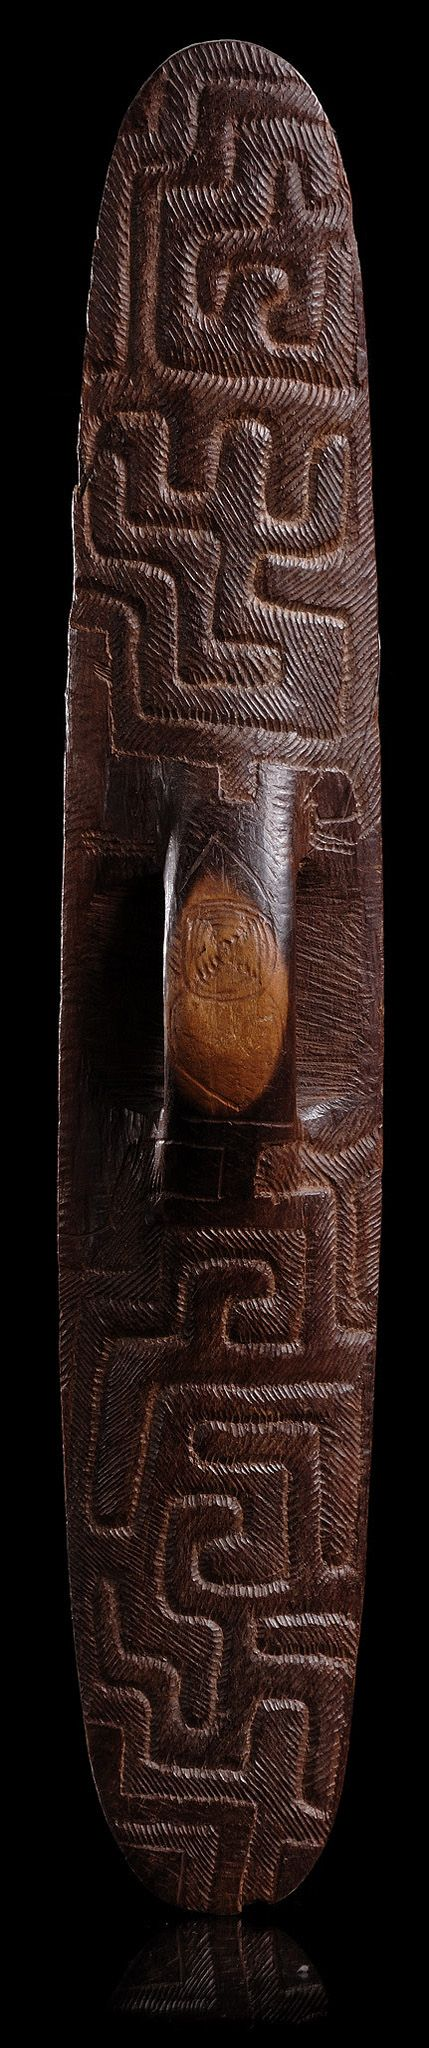 Shield from western Australia TRIBAL ART l KORTMANN